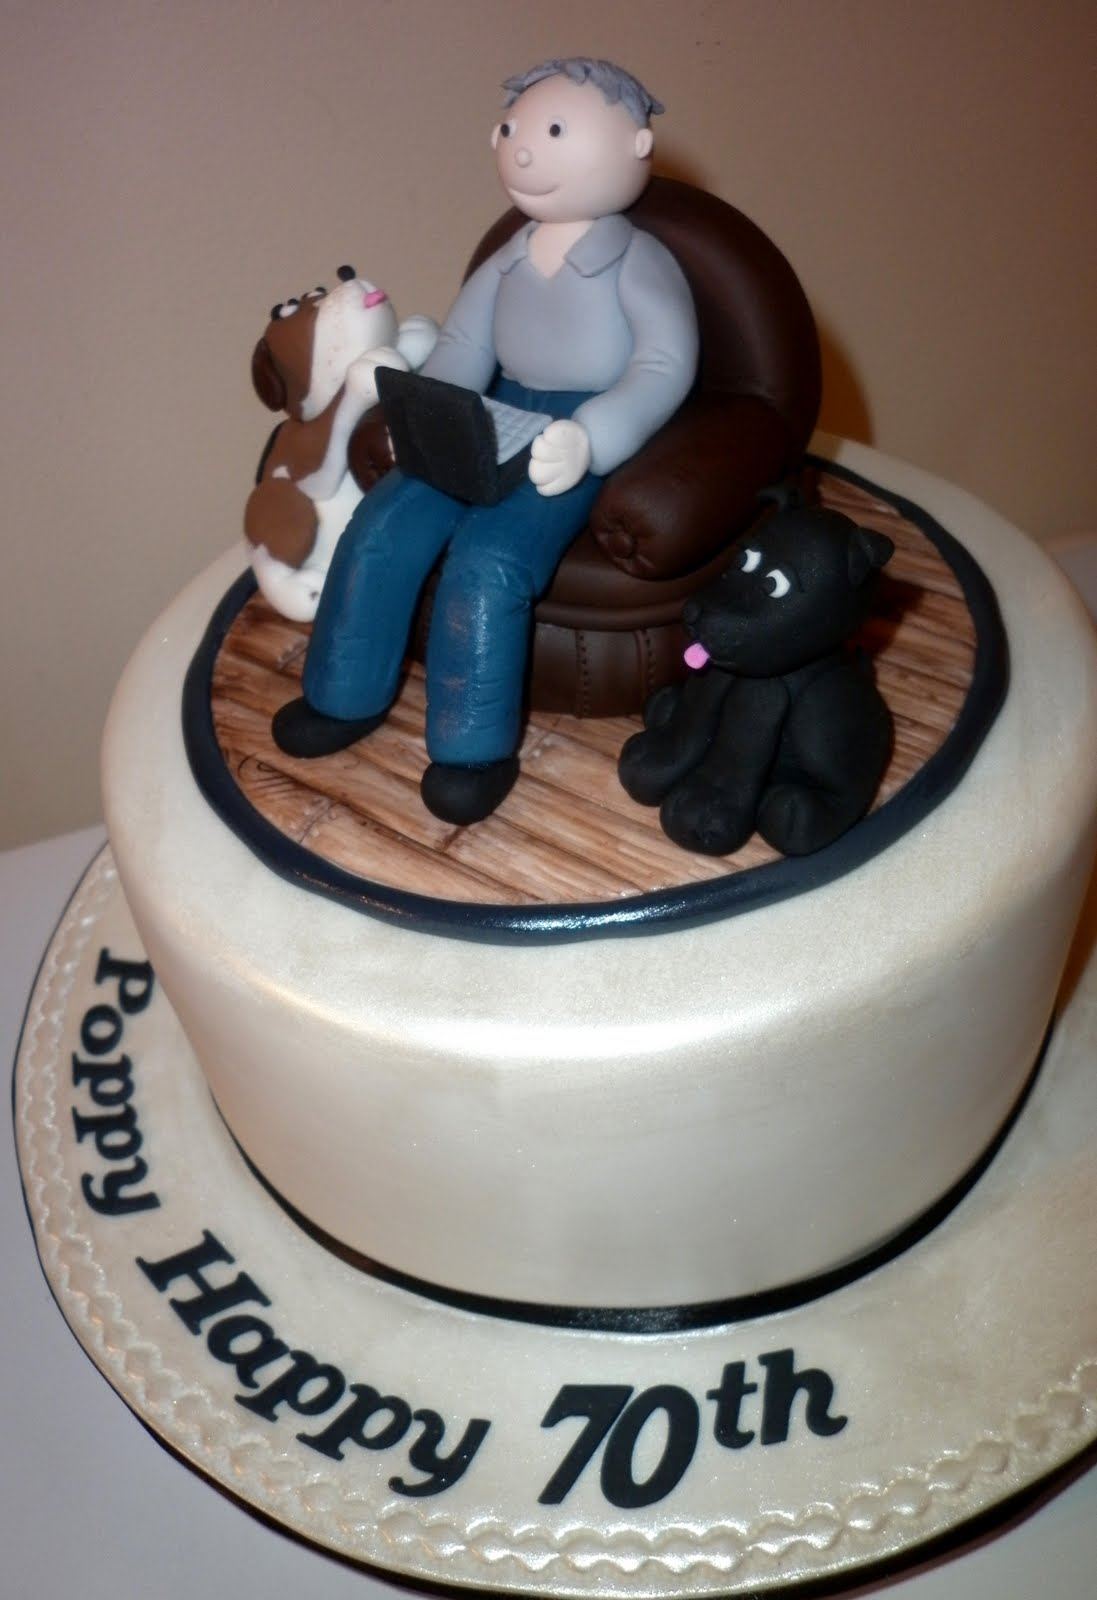 Caketopia 70th Birthday Cake